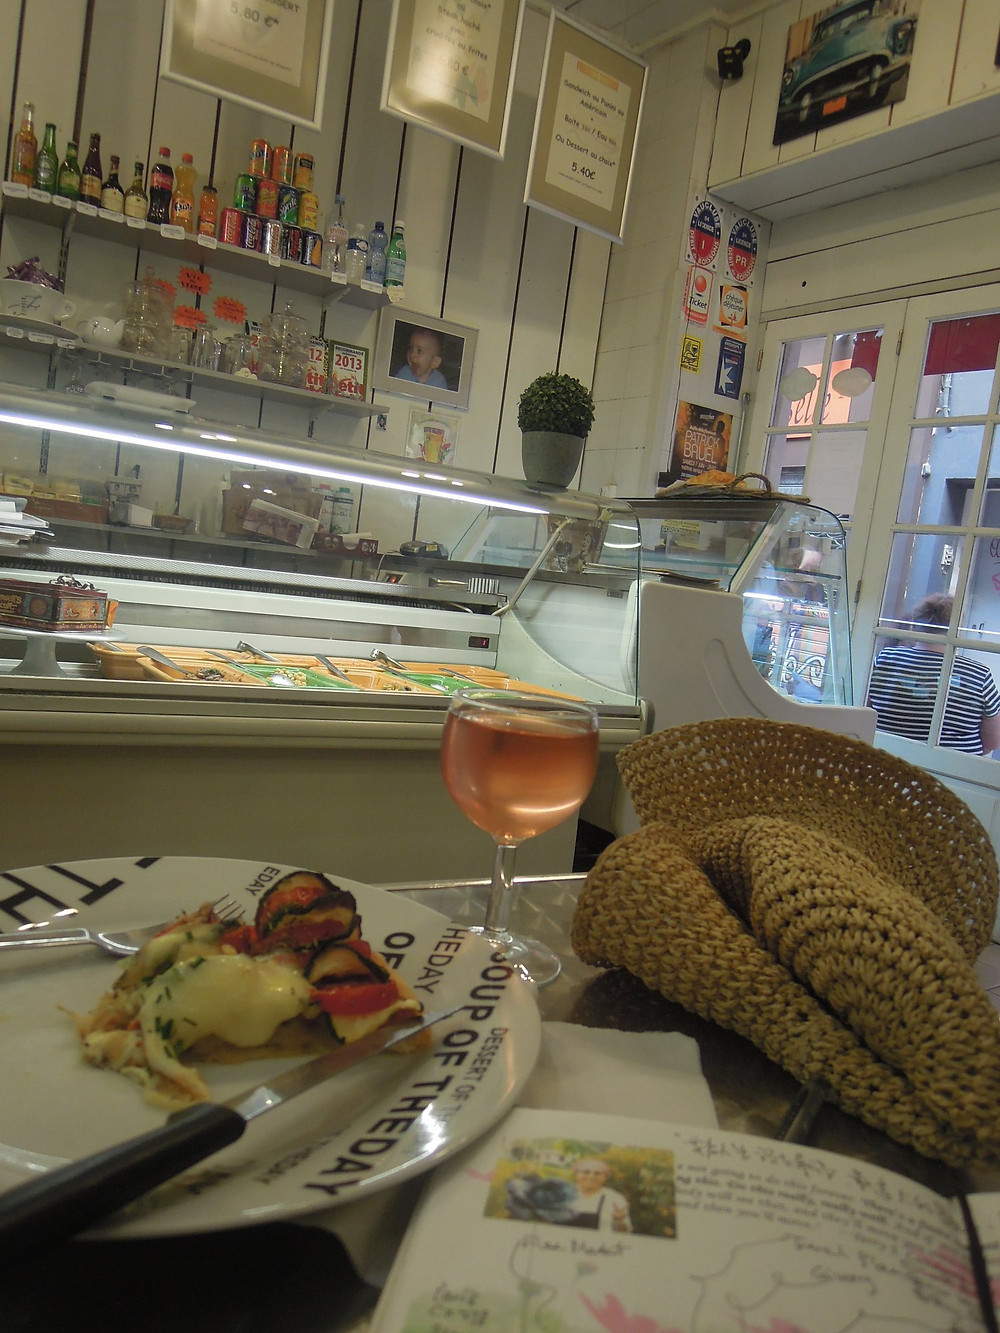 A coffee shop in Avignon where Cynthia created TLG Tea House in paper